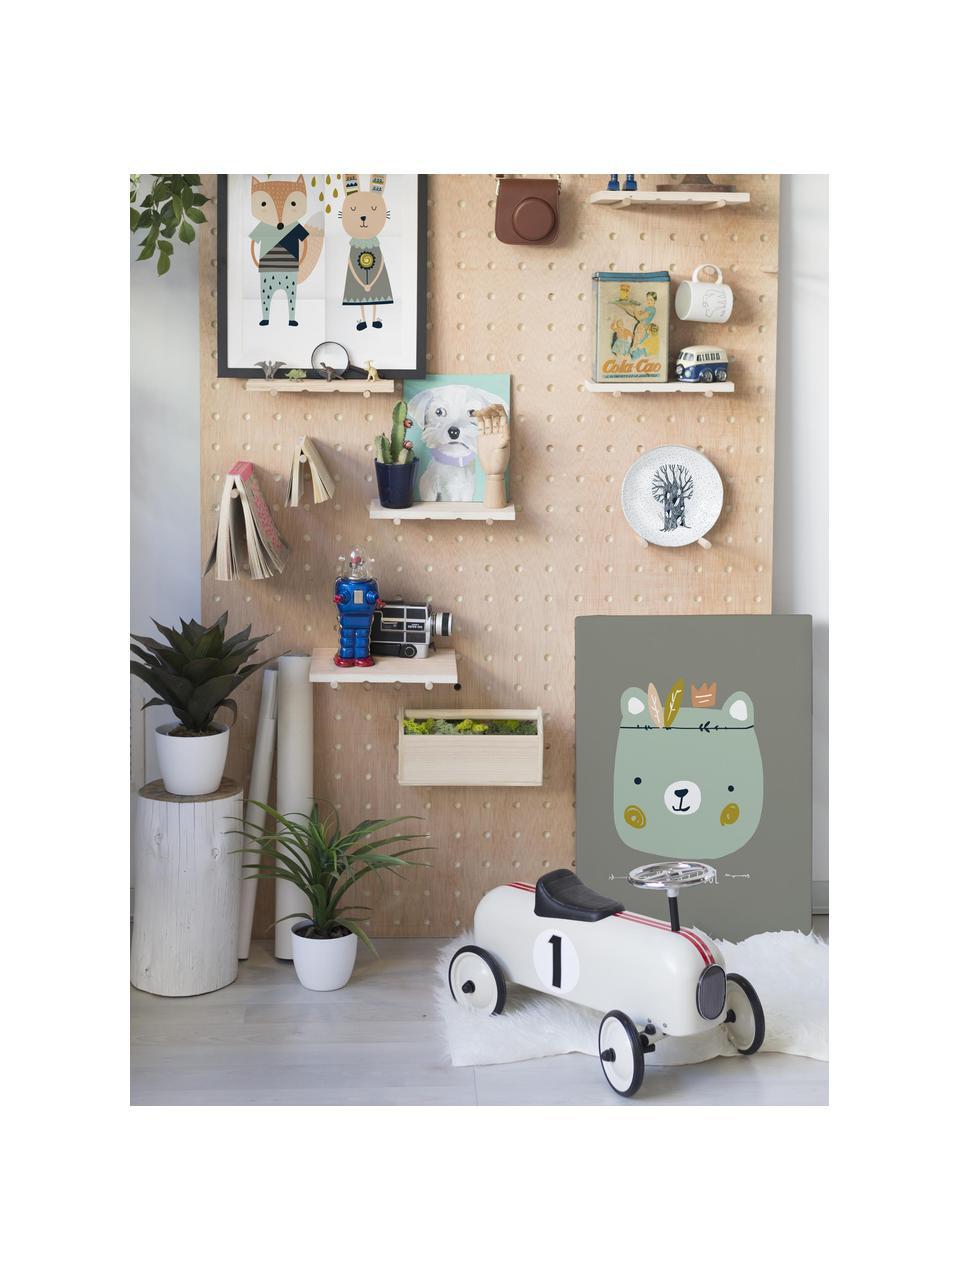 Leinwanddruck Really Cool, Bild: Digitaldruck auf Leinwand, Rahmen: Holz, lackiert, Grau, Grün, 50 x 70 cm